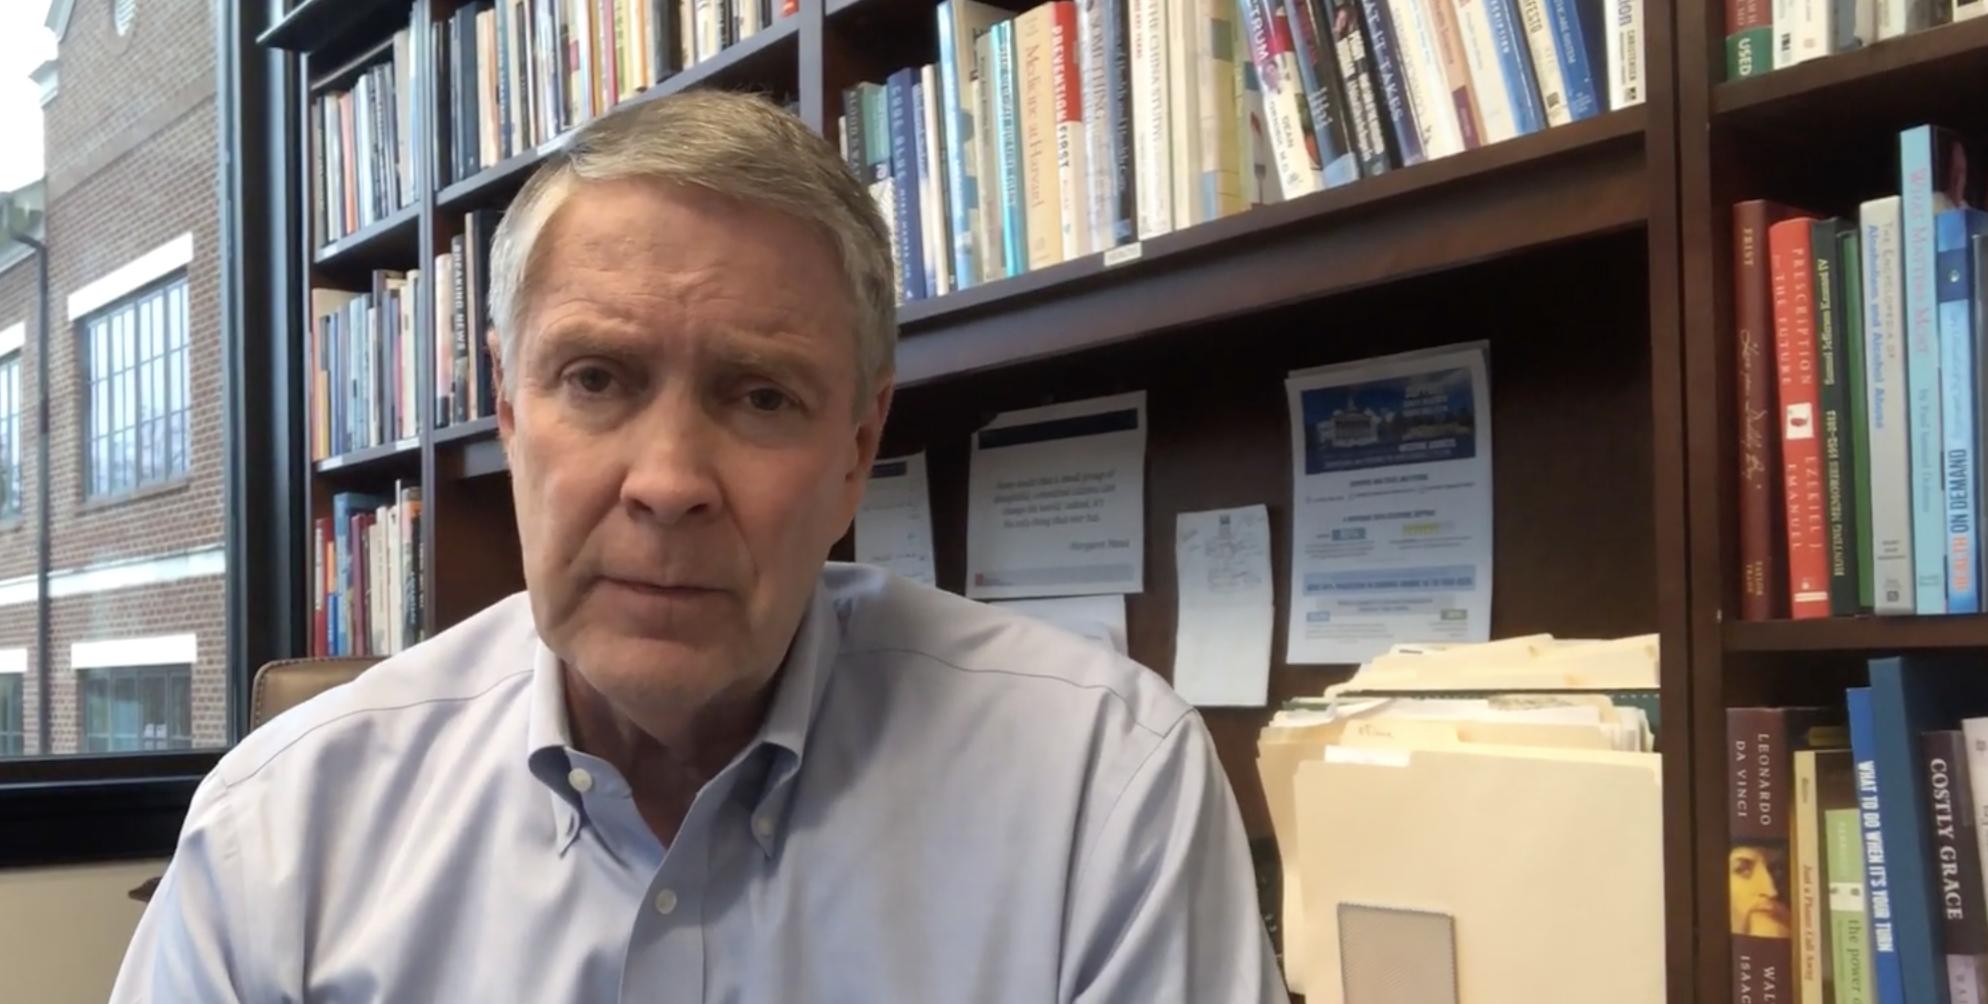 Coronavirus Q&A COVID-19 with Senator Bill Frist